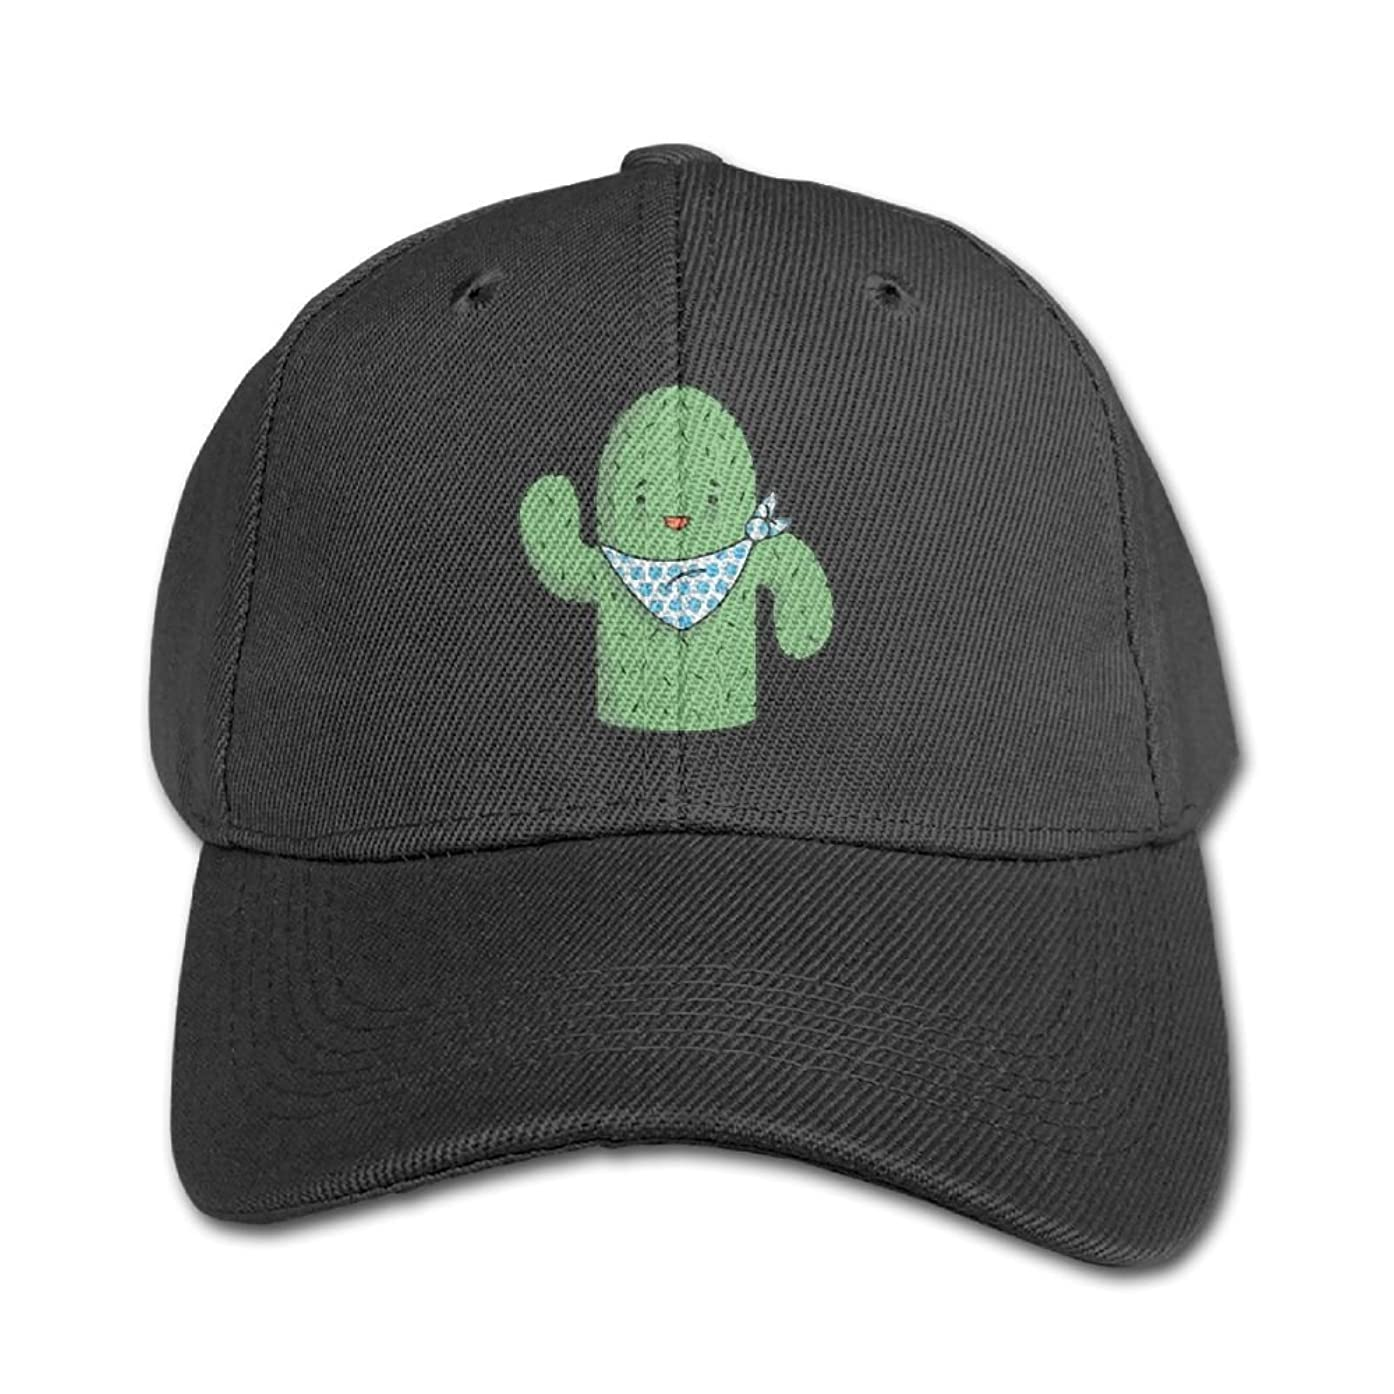 Elephant AN Cute Cactus Pure Color Baseball Cap Cotton Adjustable Kid Boys Girls Hat